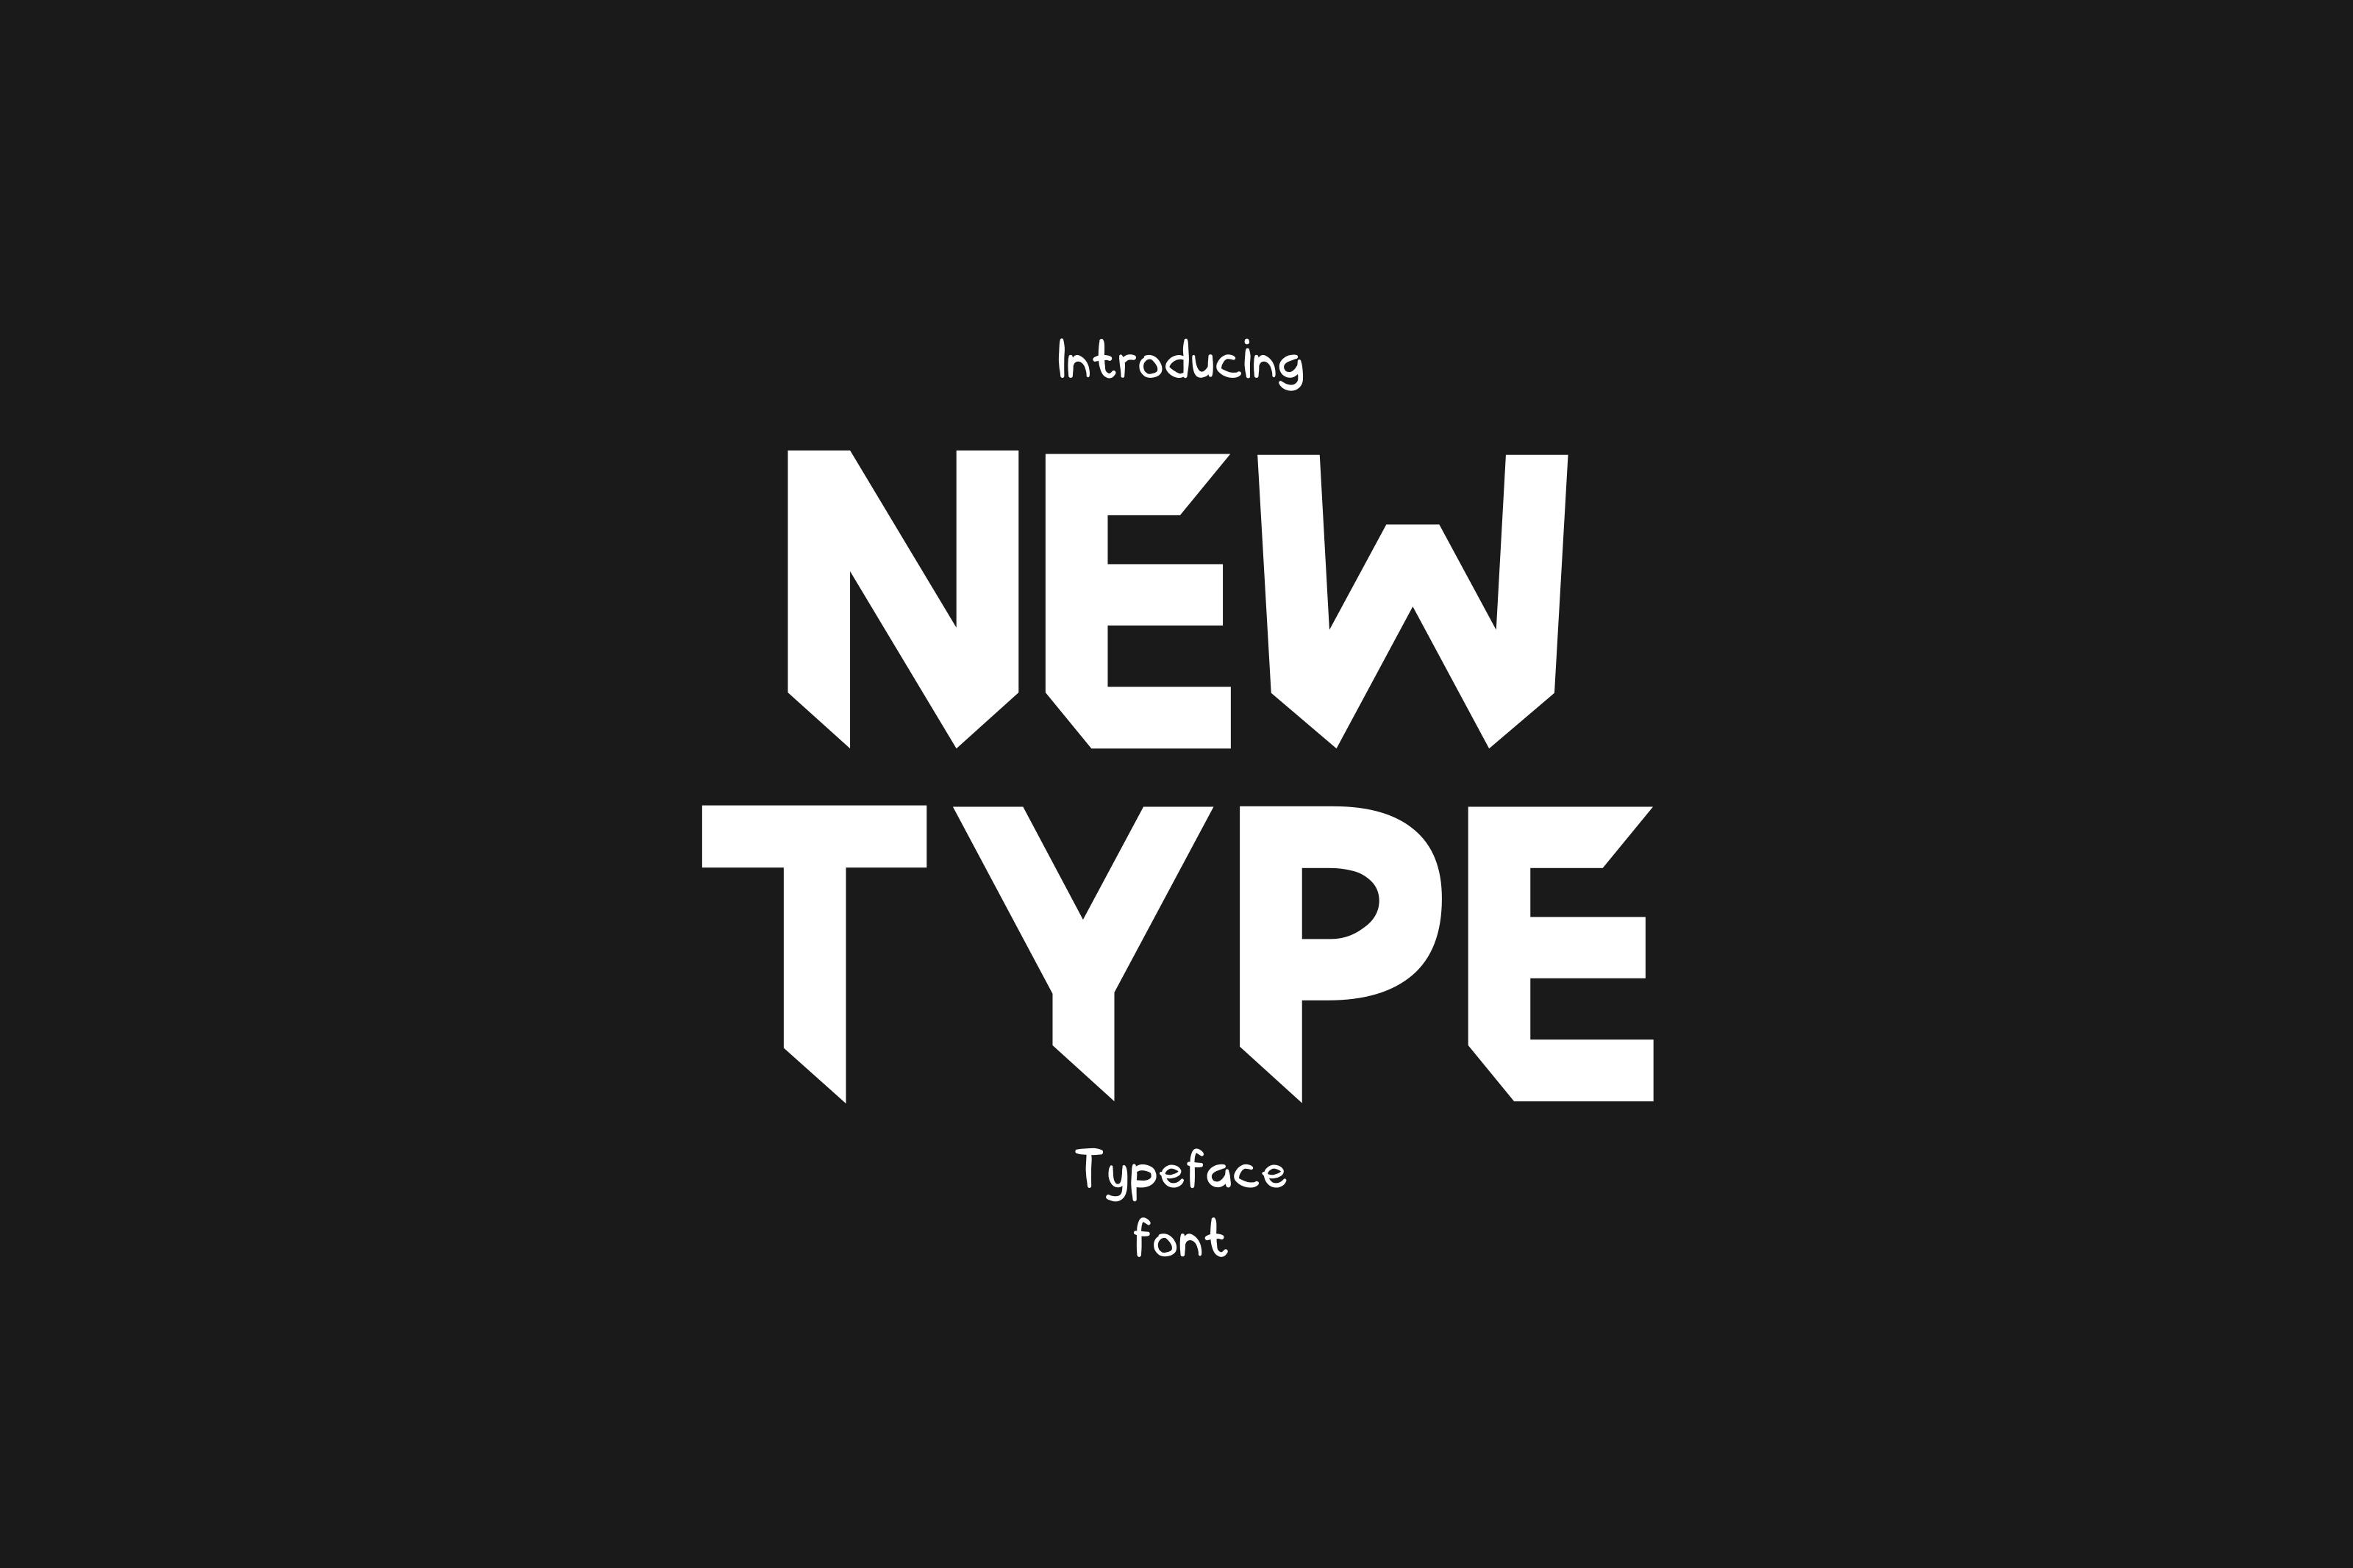 Badass Fonts Bundle - Script, Display, Sans-serif, Monogram - Just $25! - Mega Bundle Sameeh Media 06